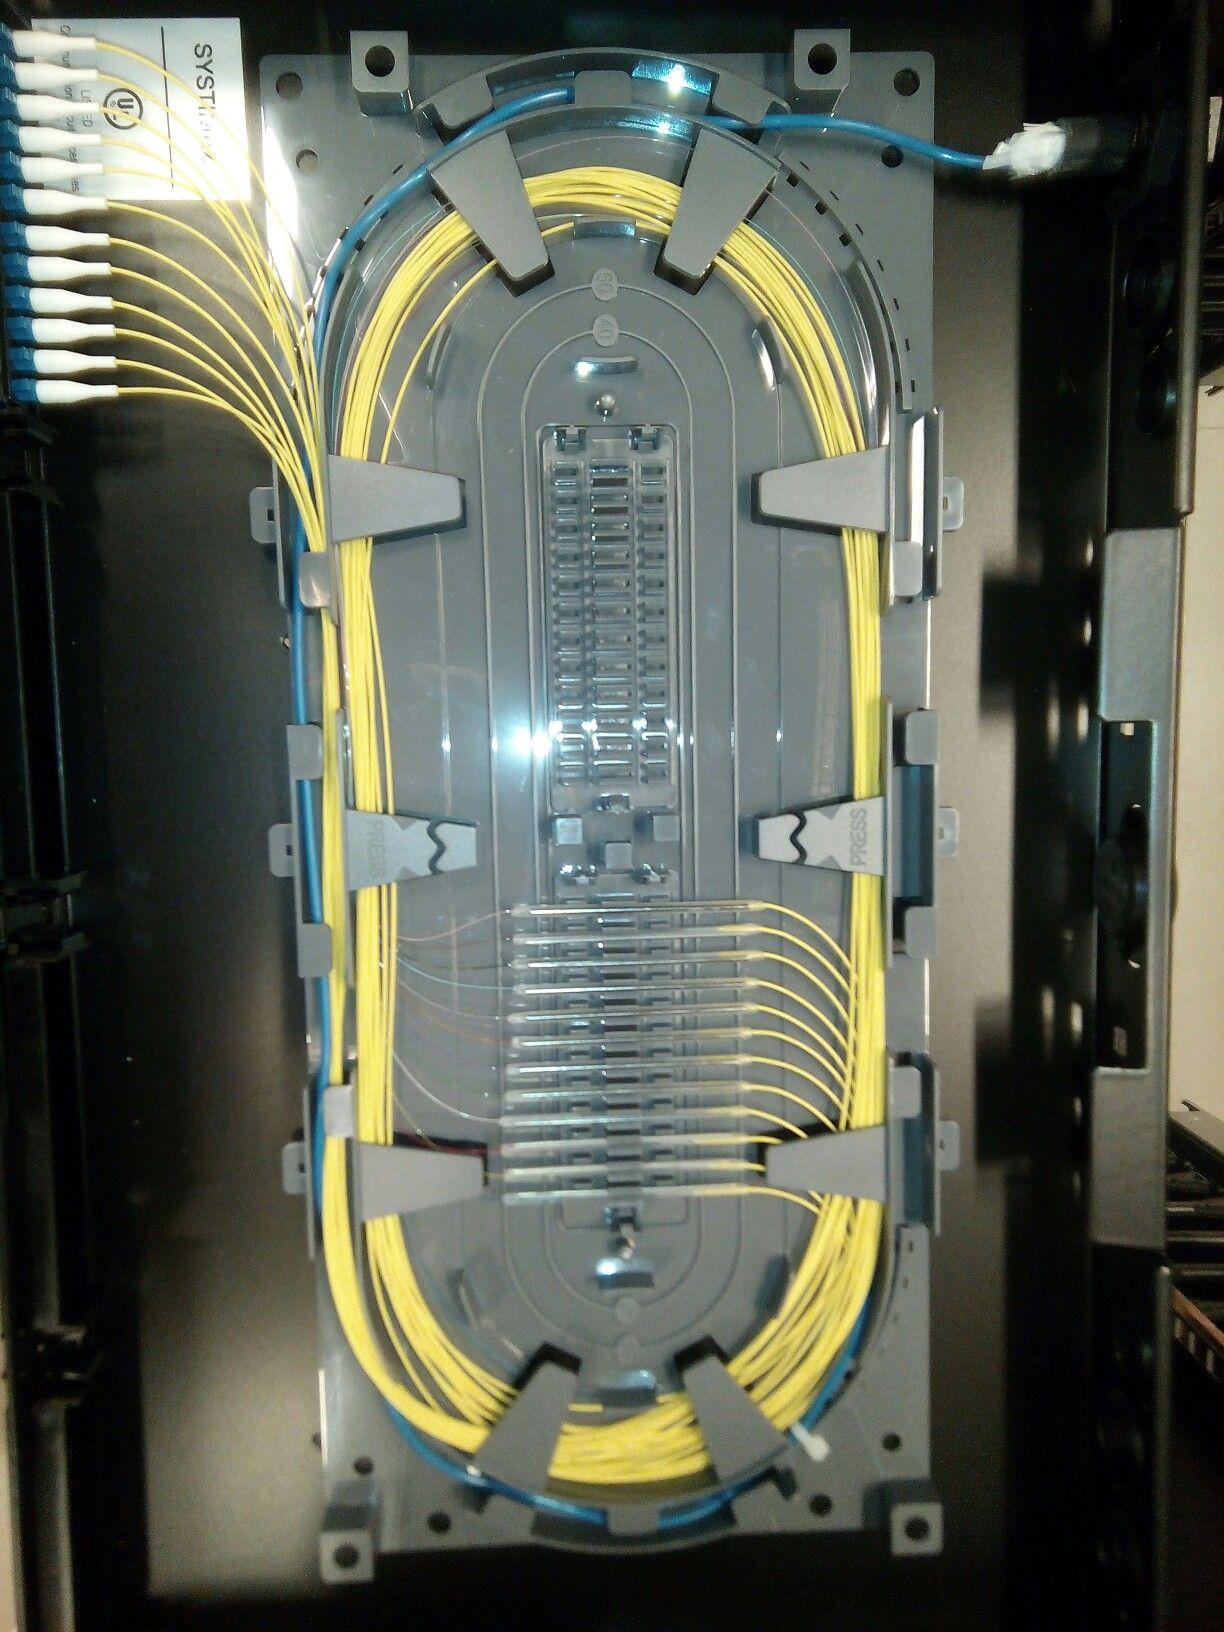 Pin By Ihssan Waheed On Data Center Fibre Optics Fiber Optic Electrical Wiring